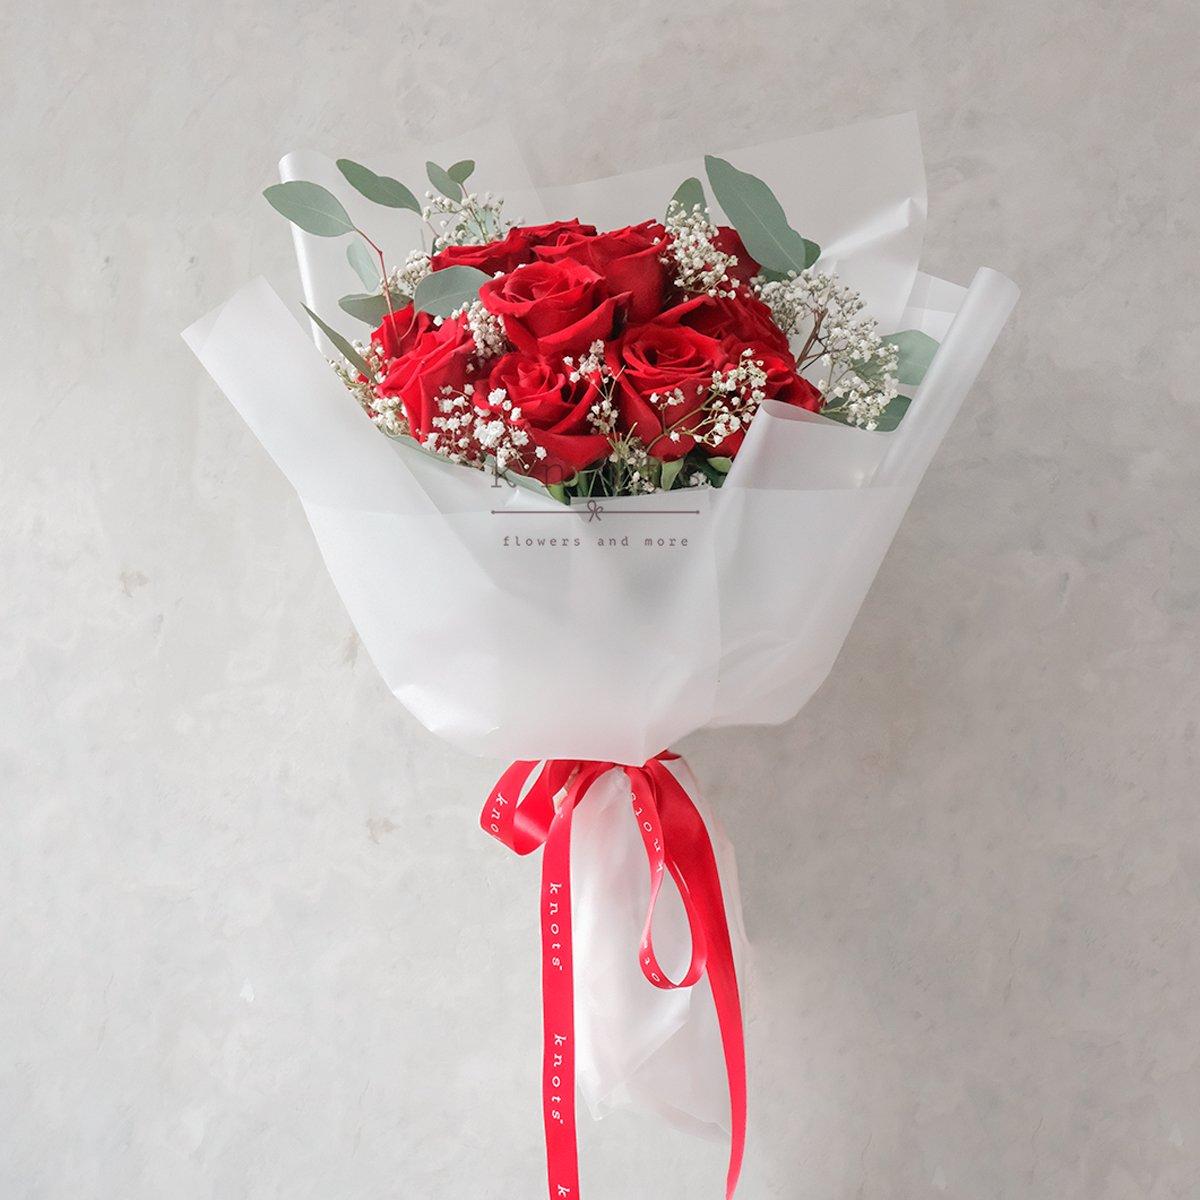 Messenger of Love (Red Ecuadorian Roses Bouquet)